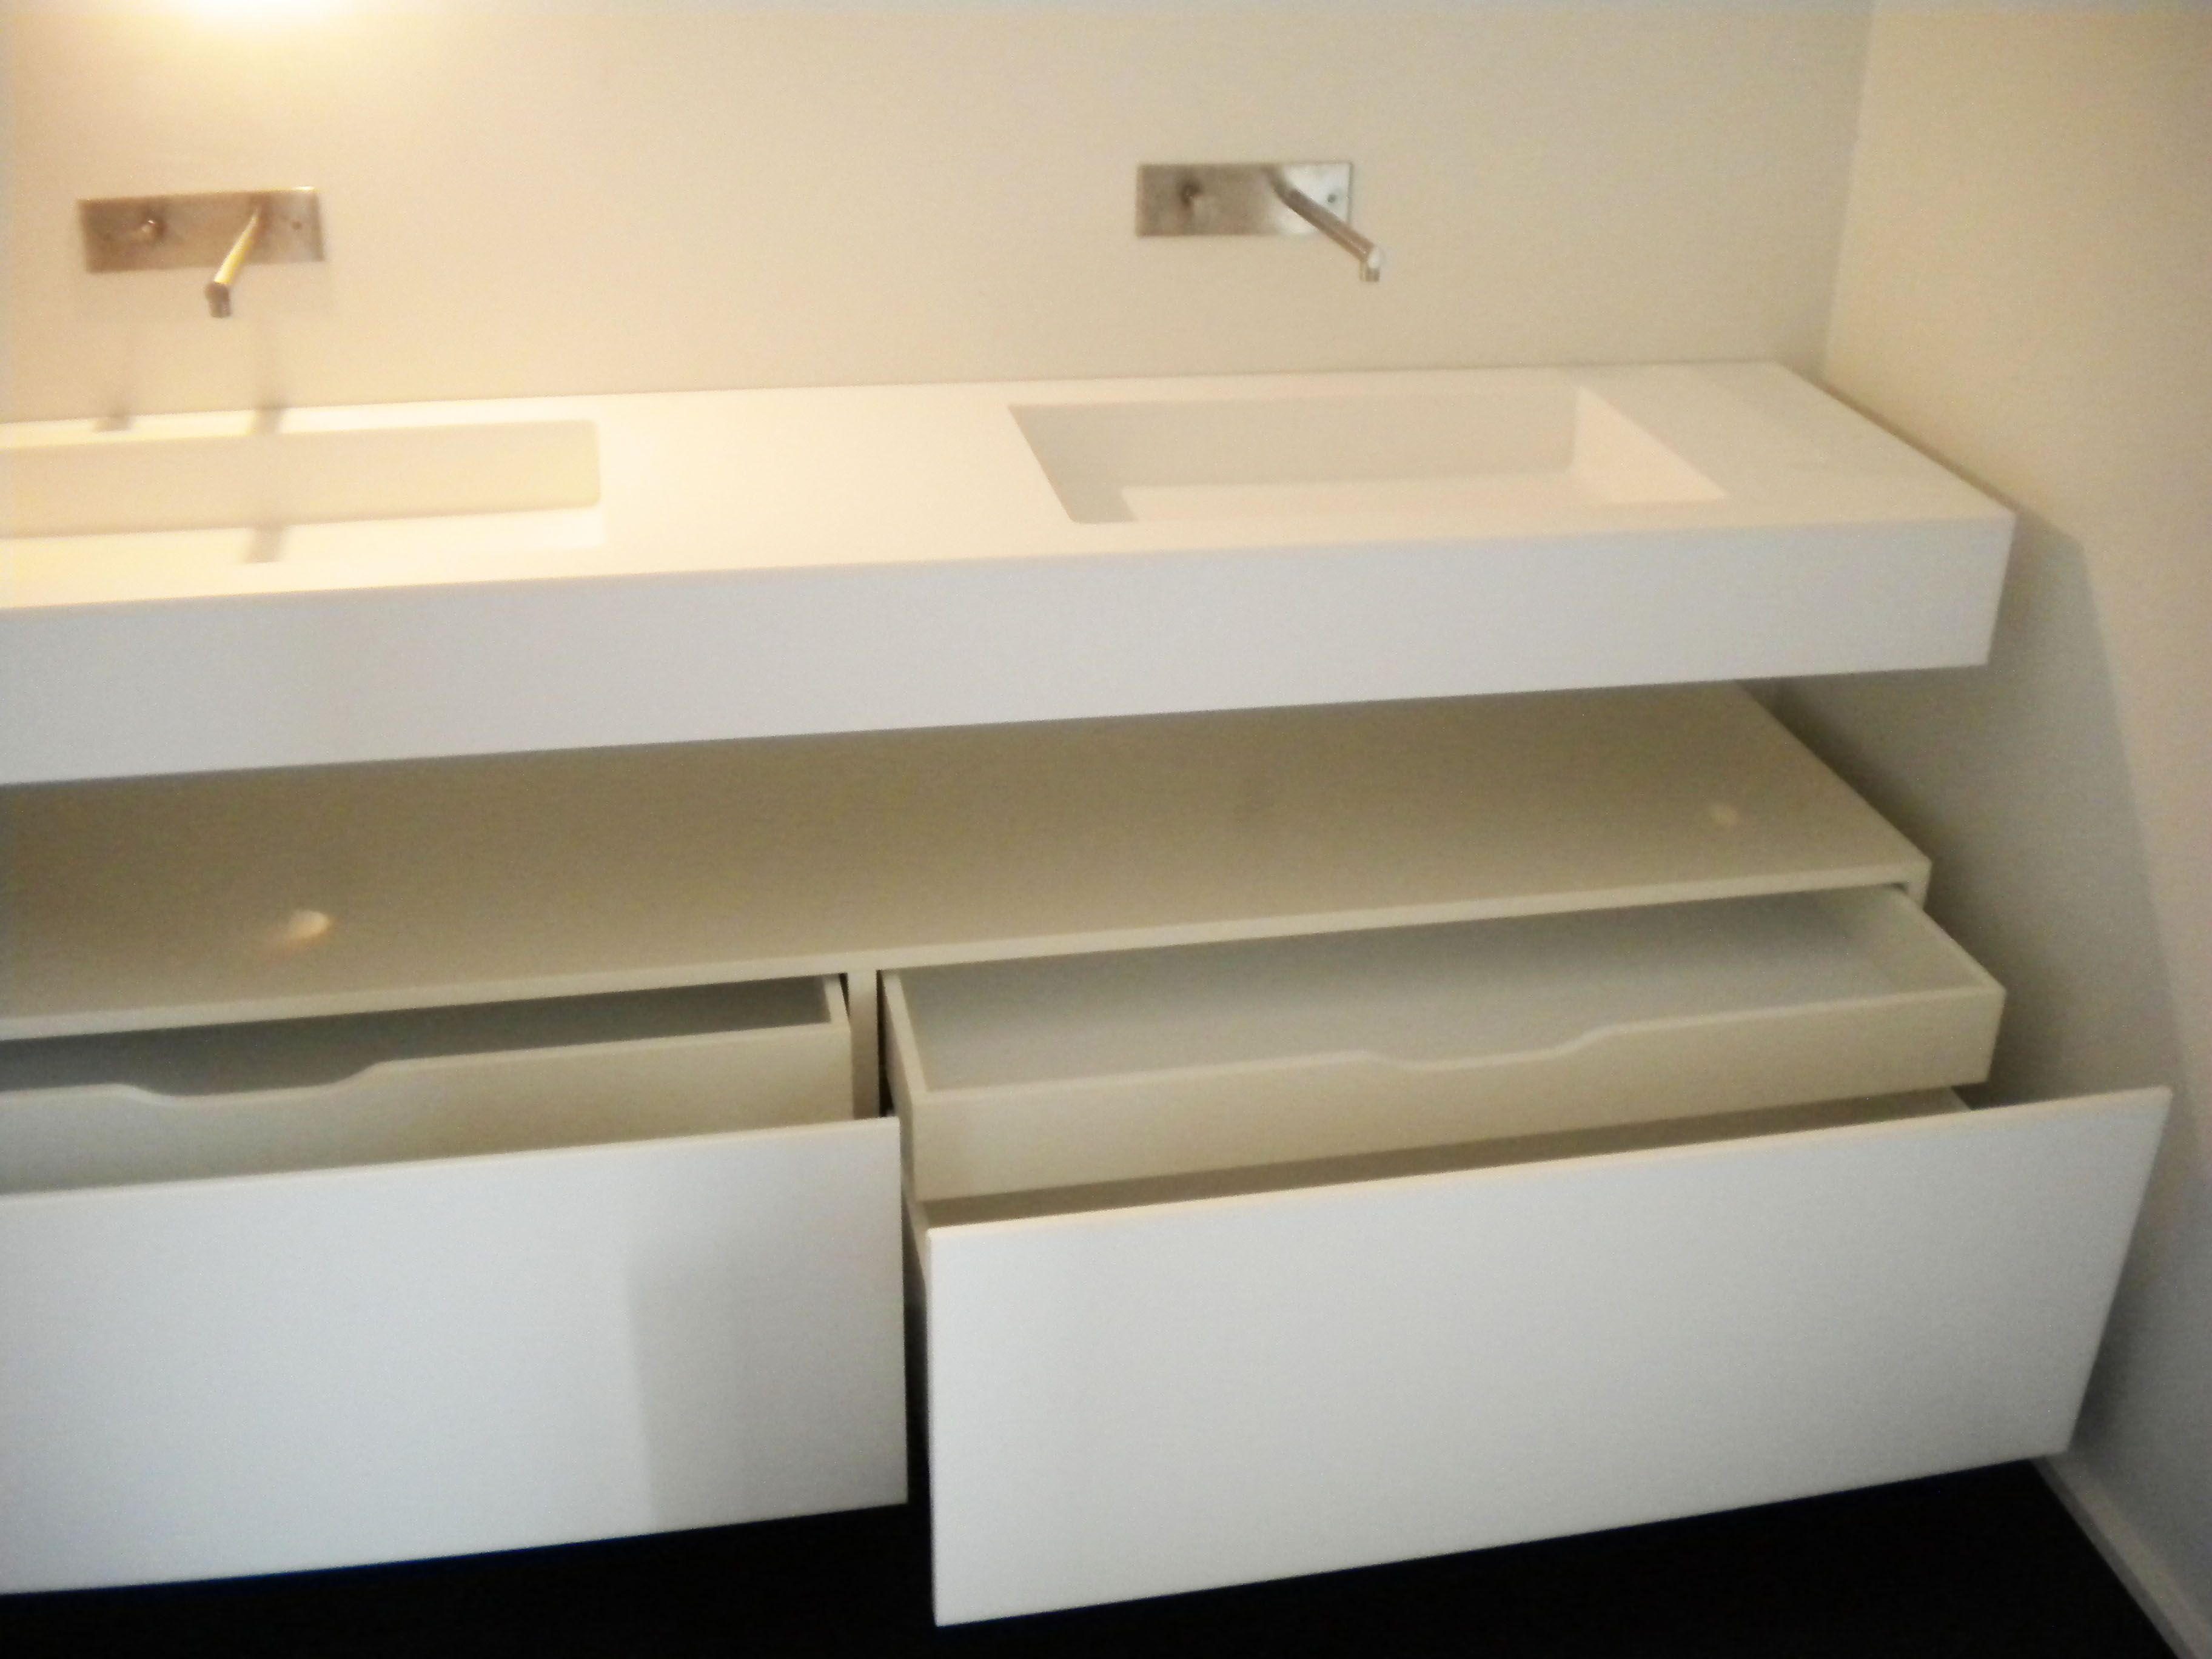 Mobile sottolavabo bagno ikea mobile sottolavabo bagno moderno